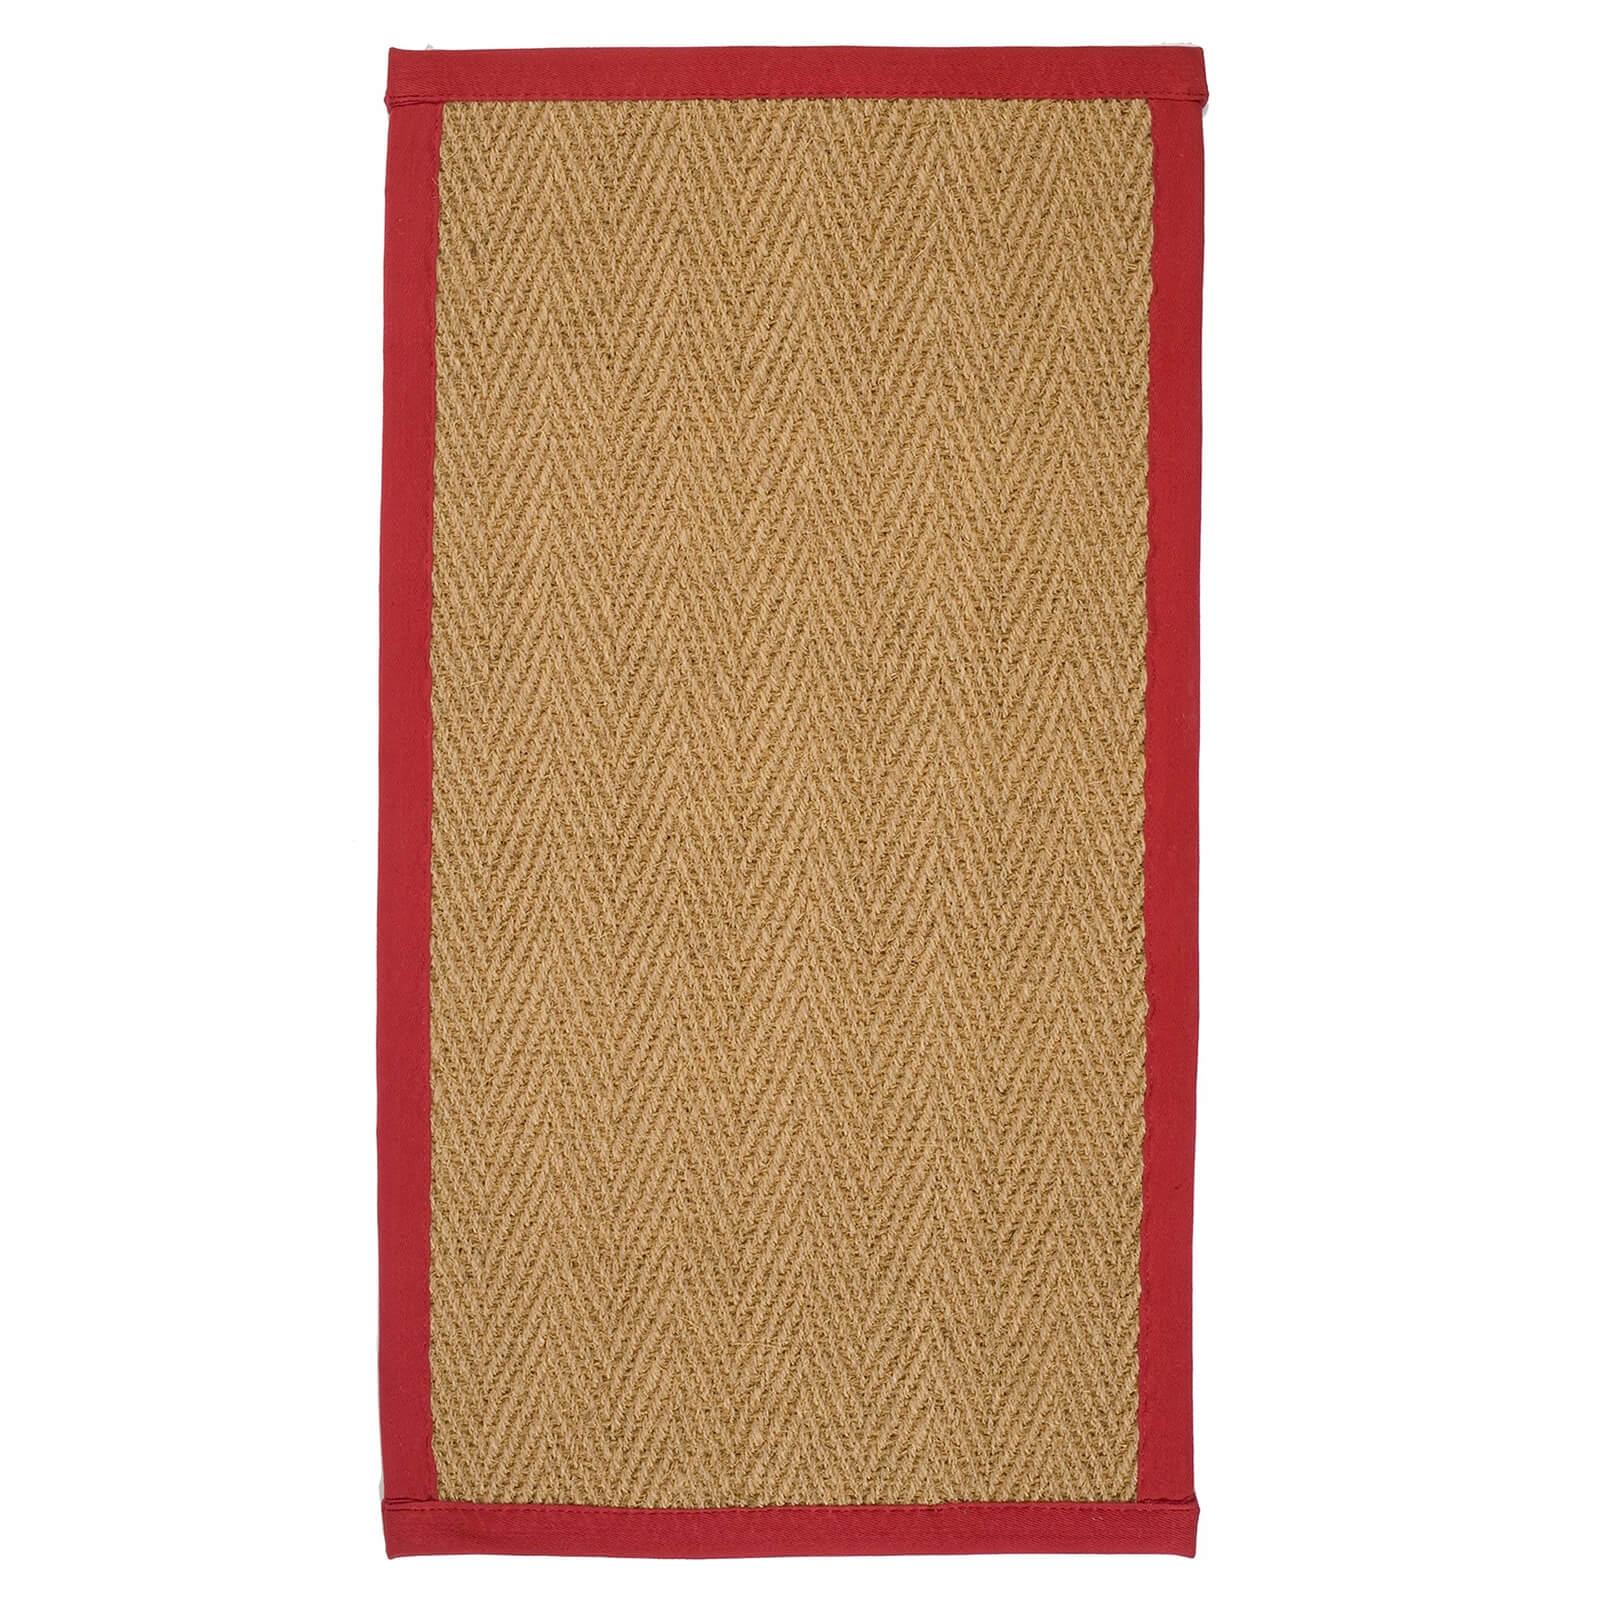 Coir Herringbone Rug - With Red Border